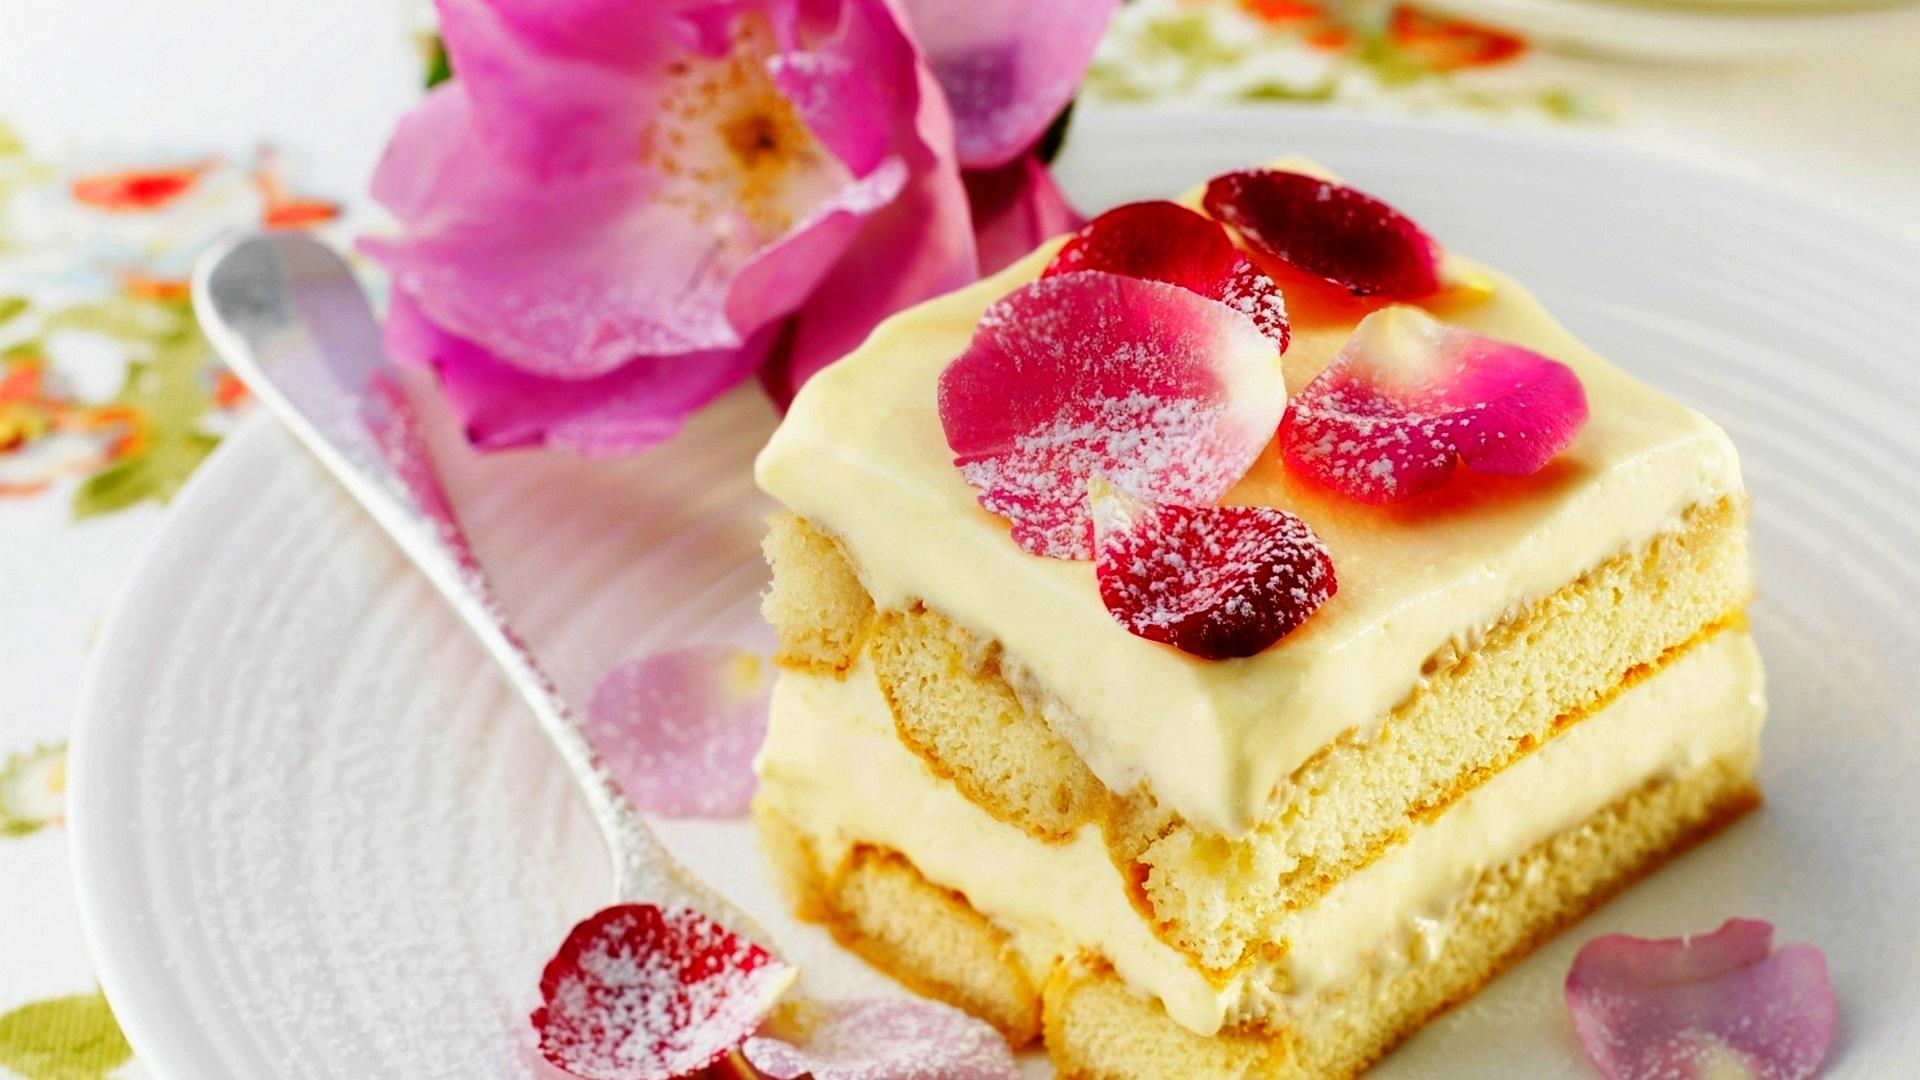 1920x1080 全高清 桌布 甜品,甜蛋糕,玫瑰花,花瓣图片